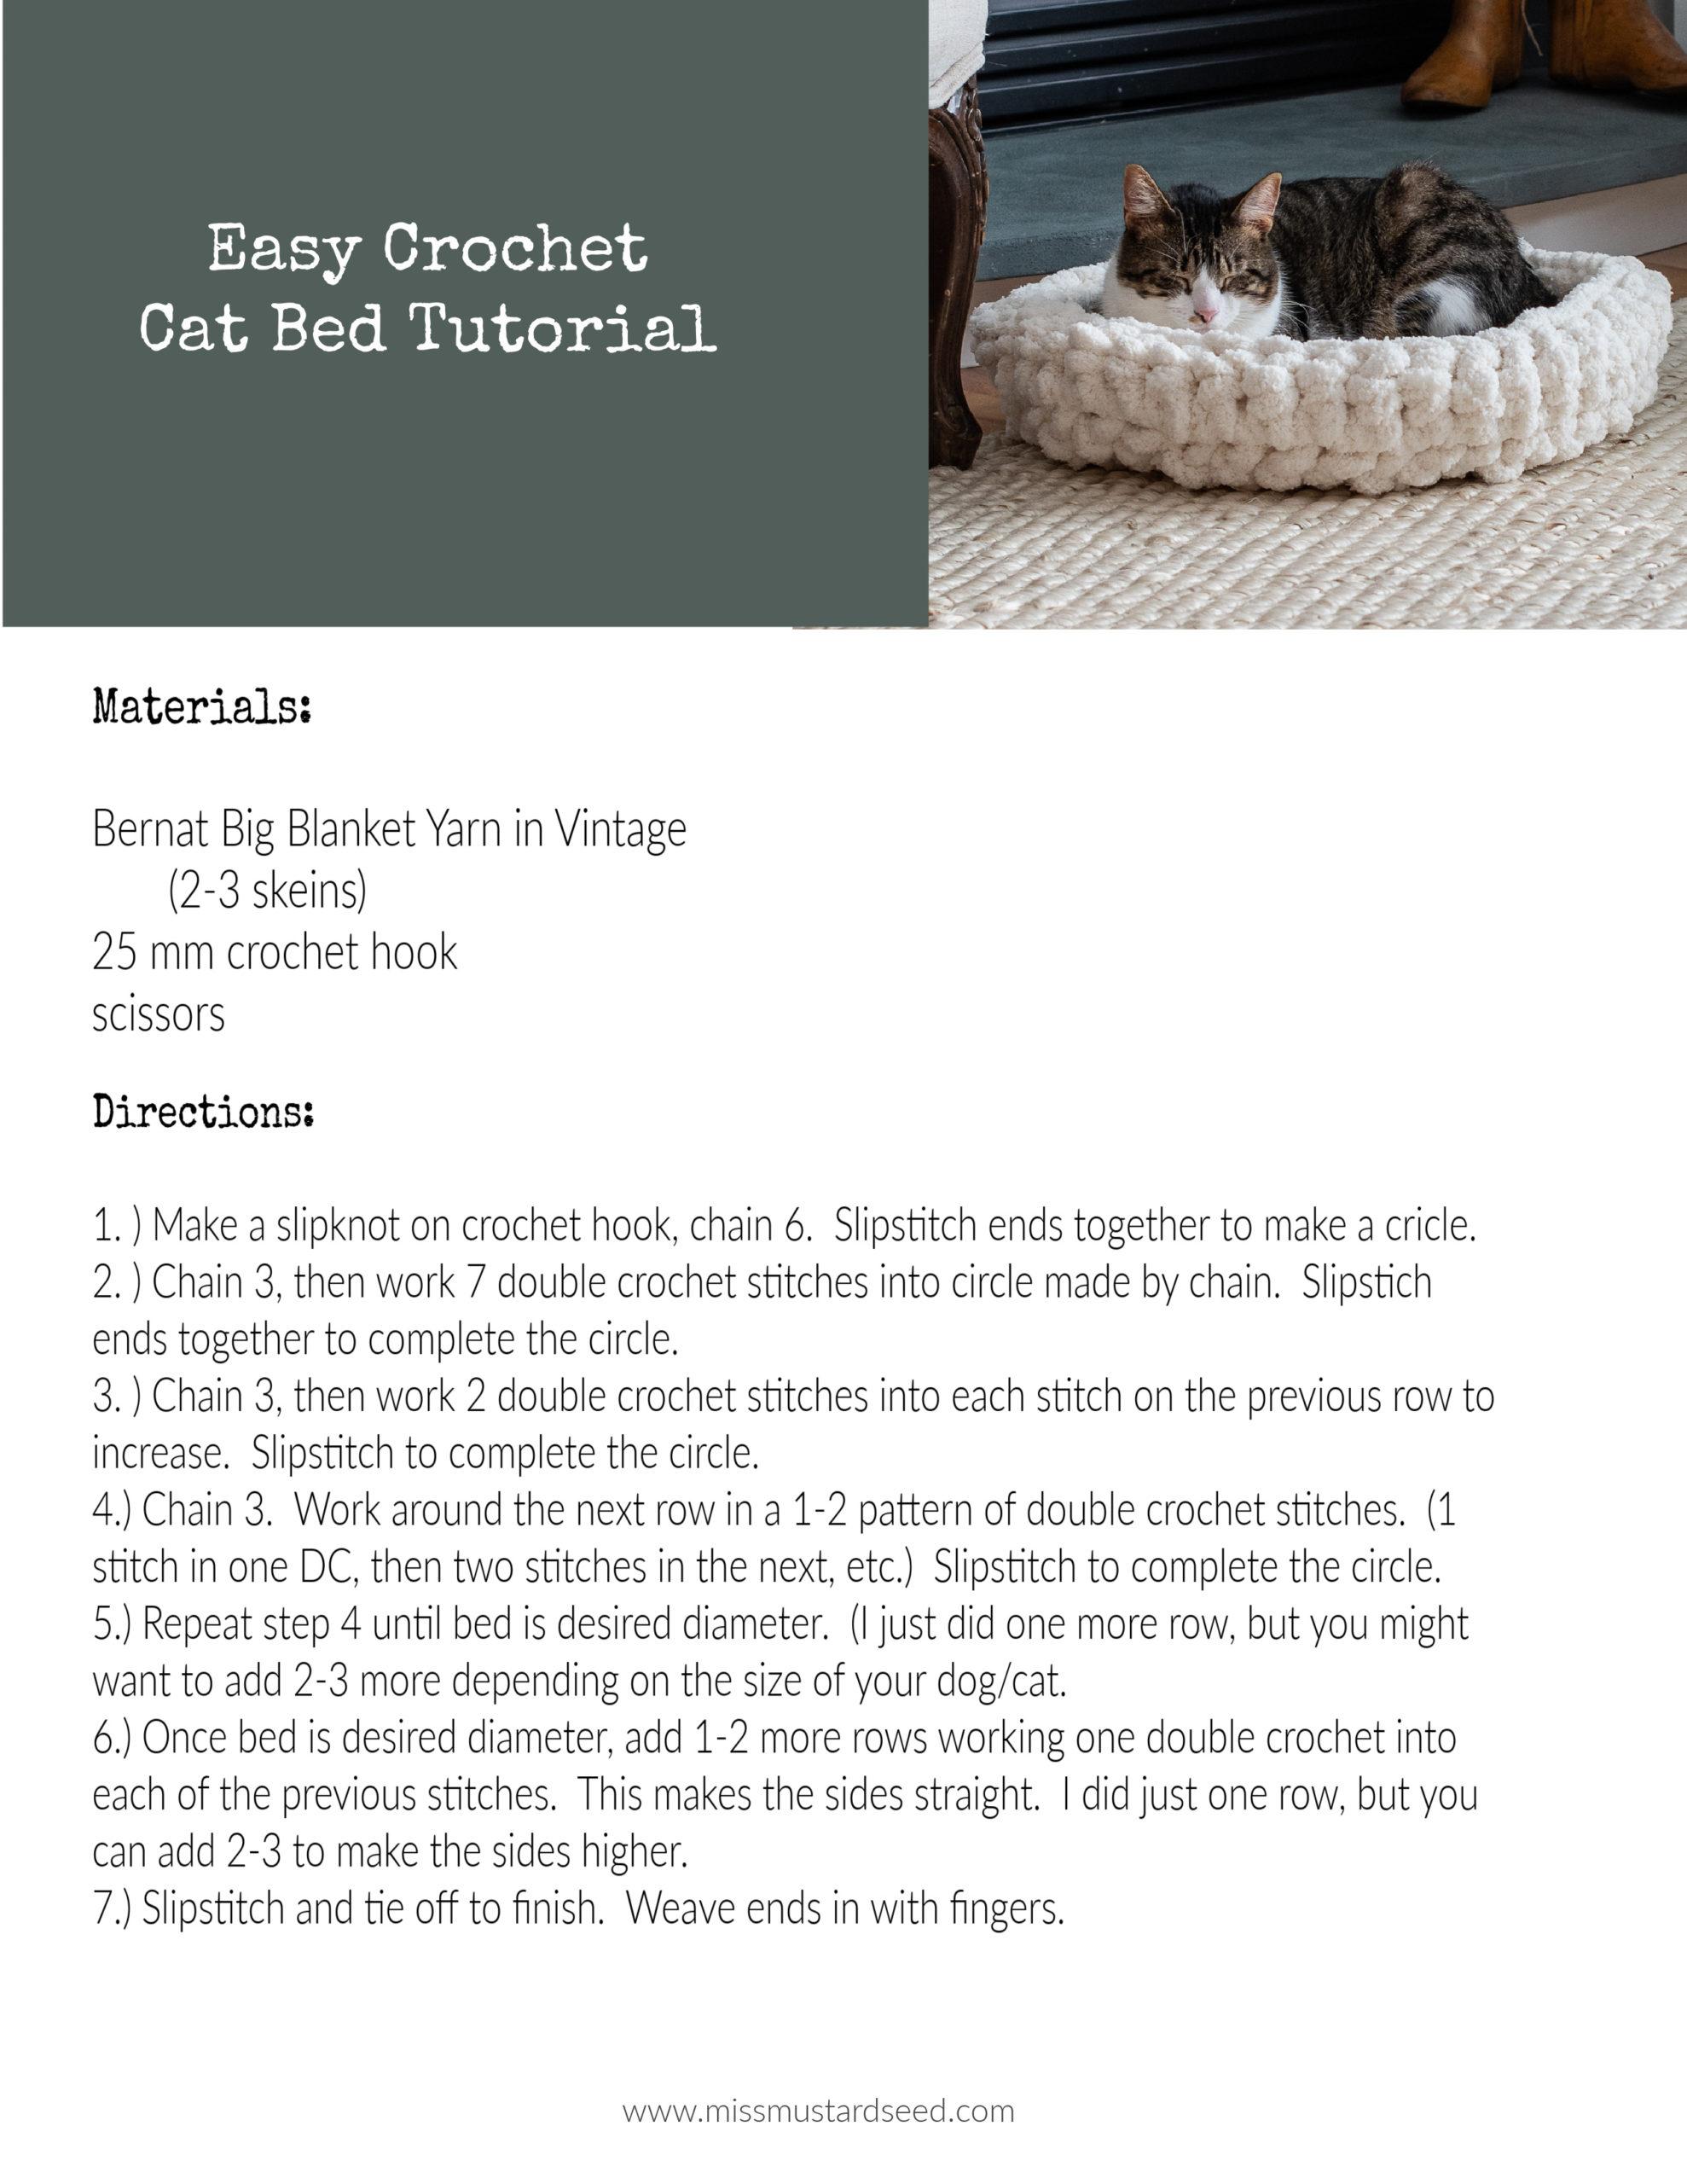 easy free crochet cat bed tutorial & pattern   miss mustard seed